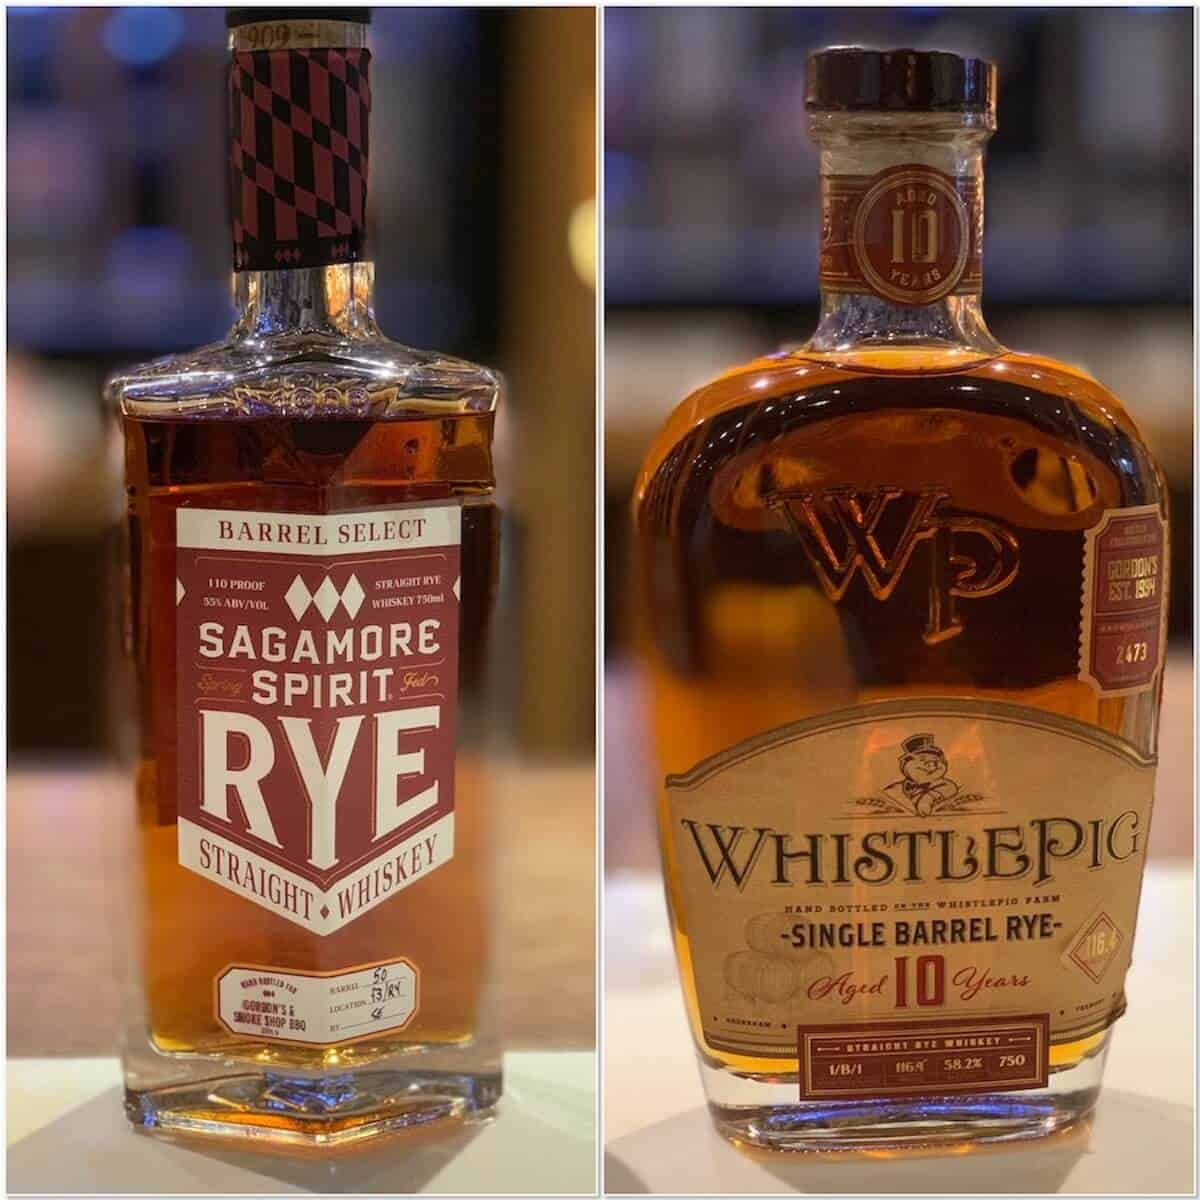 Gordon's Single Barrel Selections, Sagamore Rye, WhistlePig